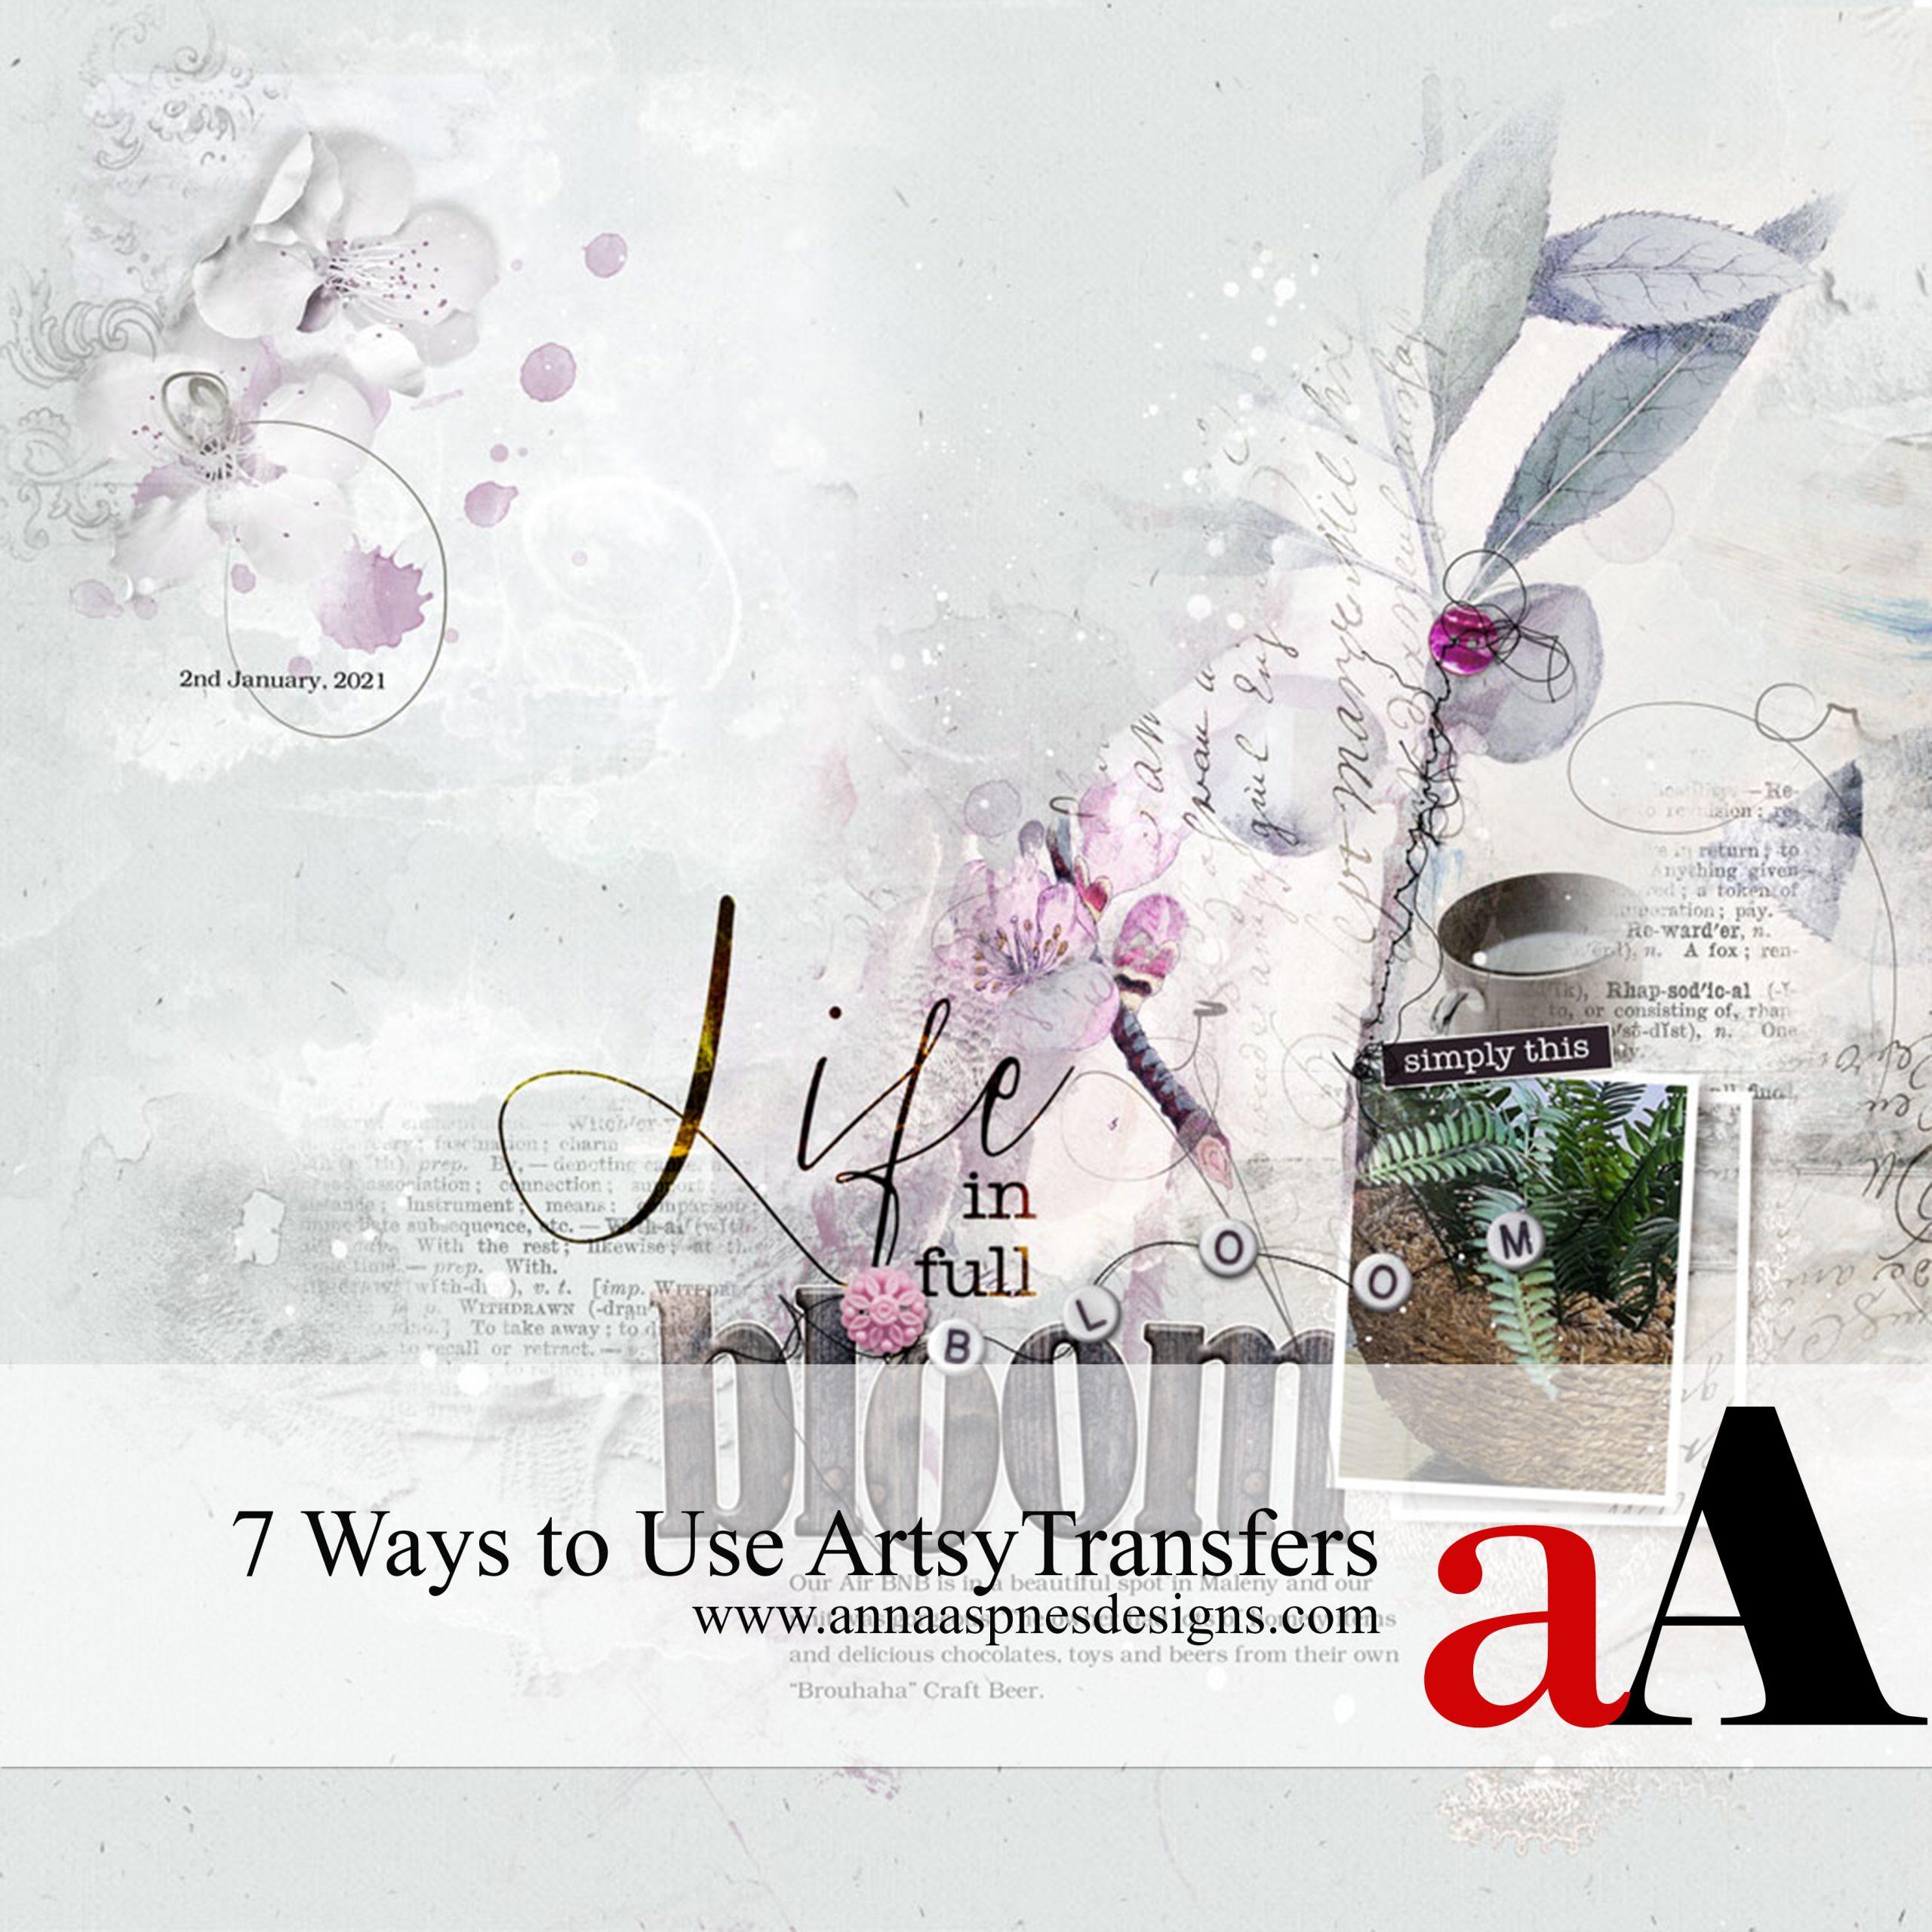 7 Ways to Use ArtsyTransfers